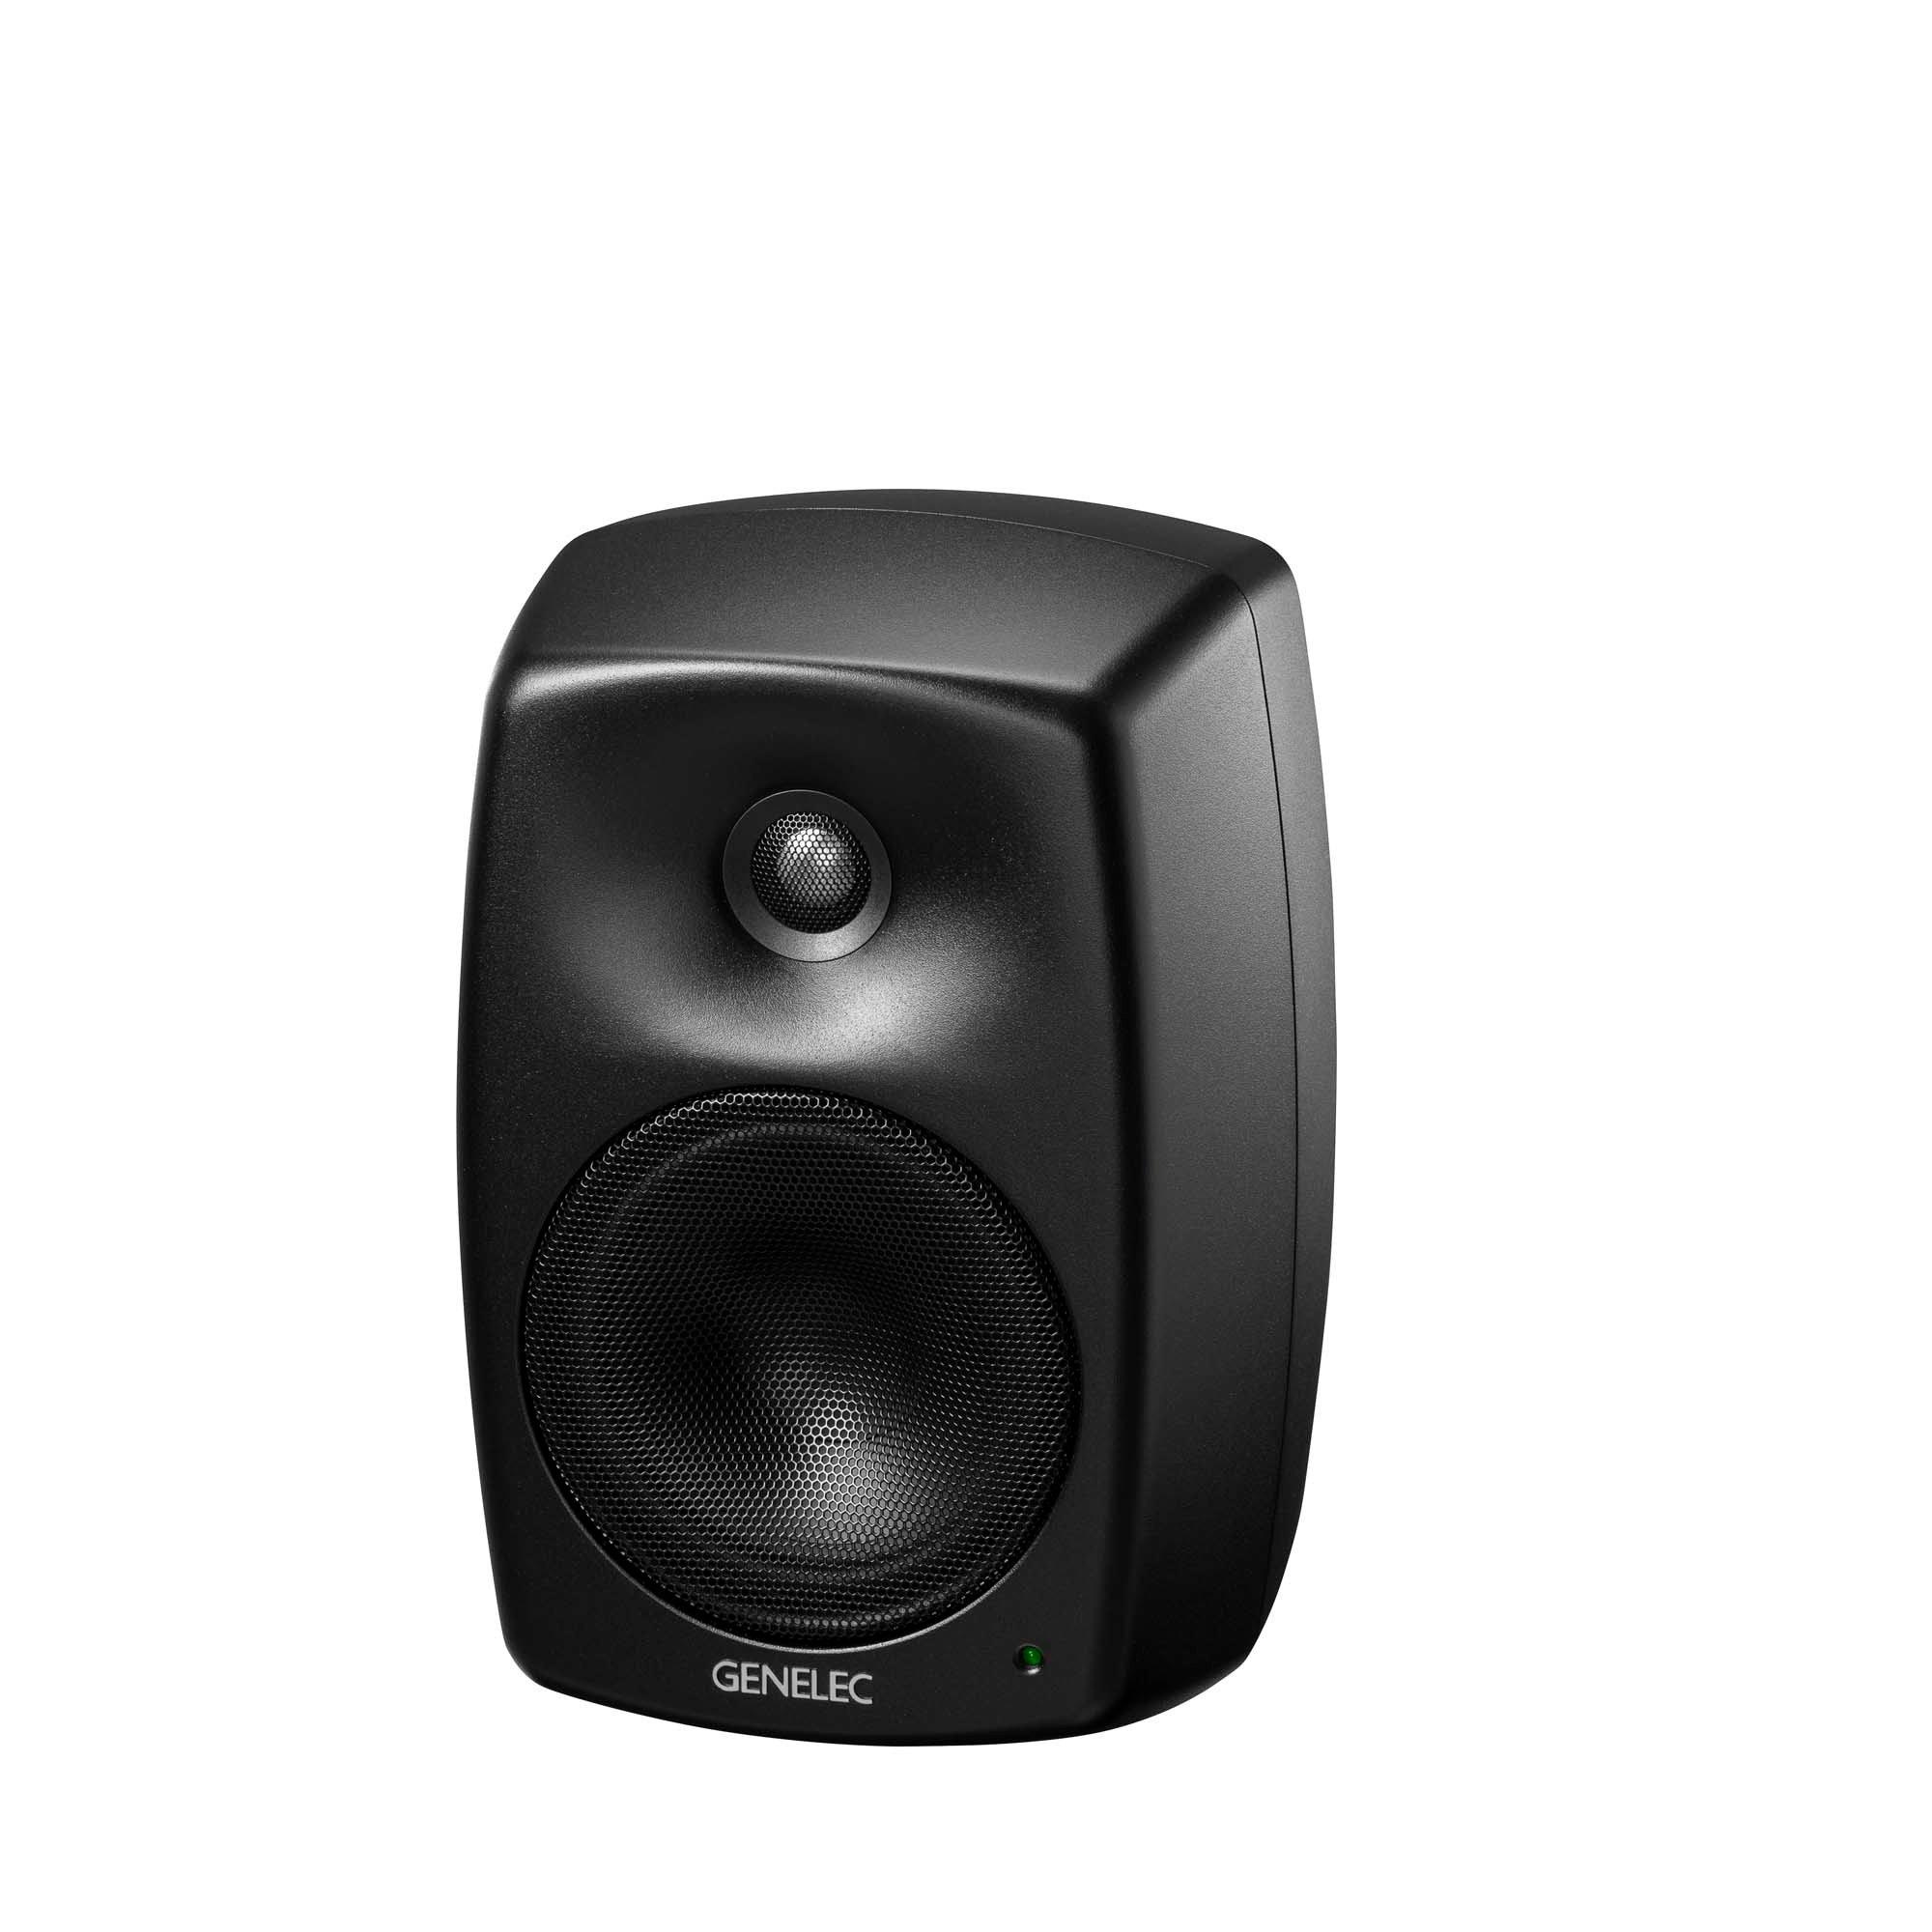 Genelec 4430a monitor audio speaker ip ethernet network midiware studio pro audio audiofader